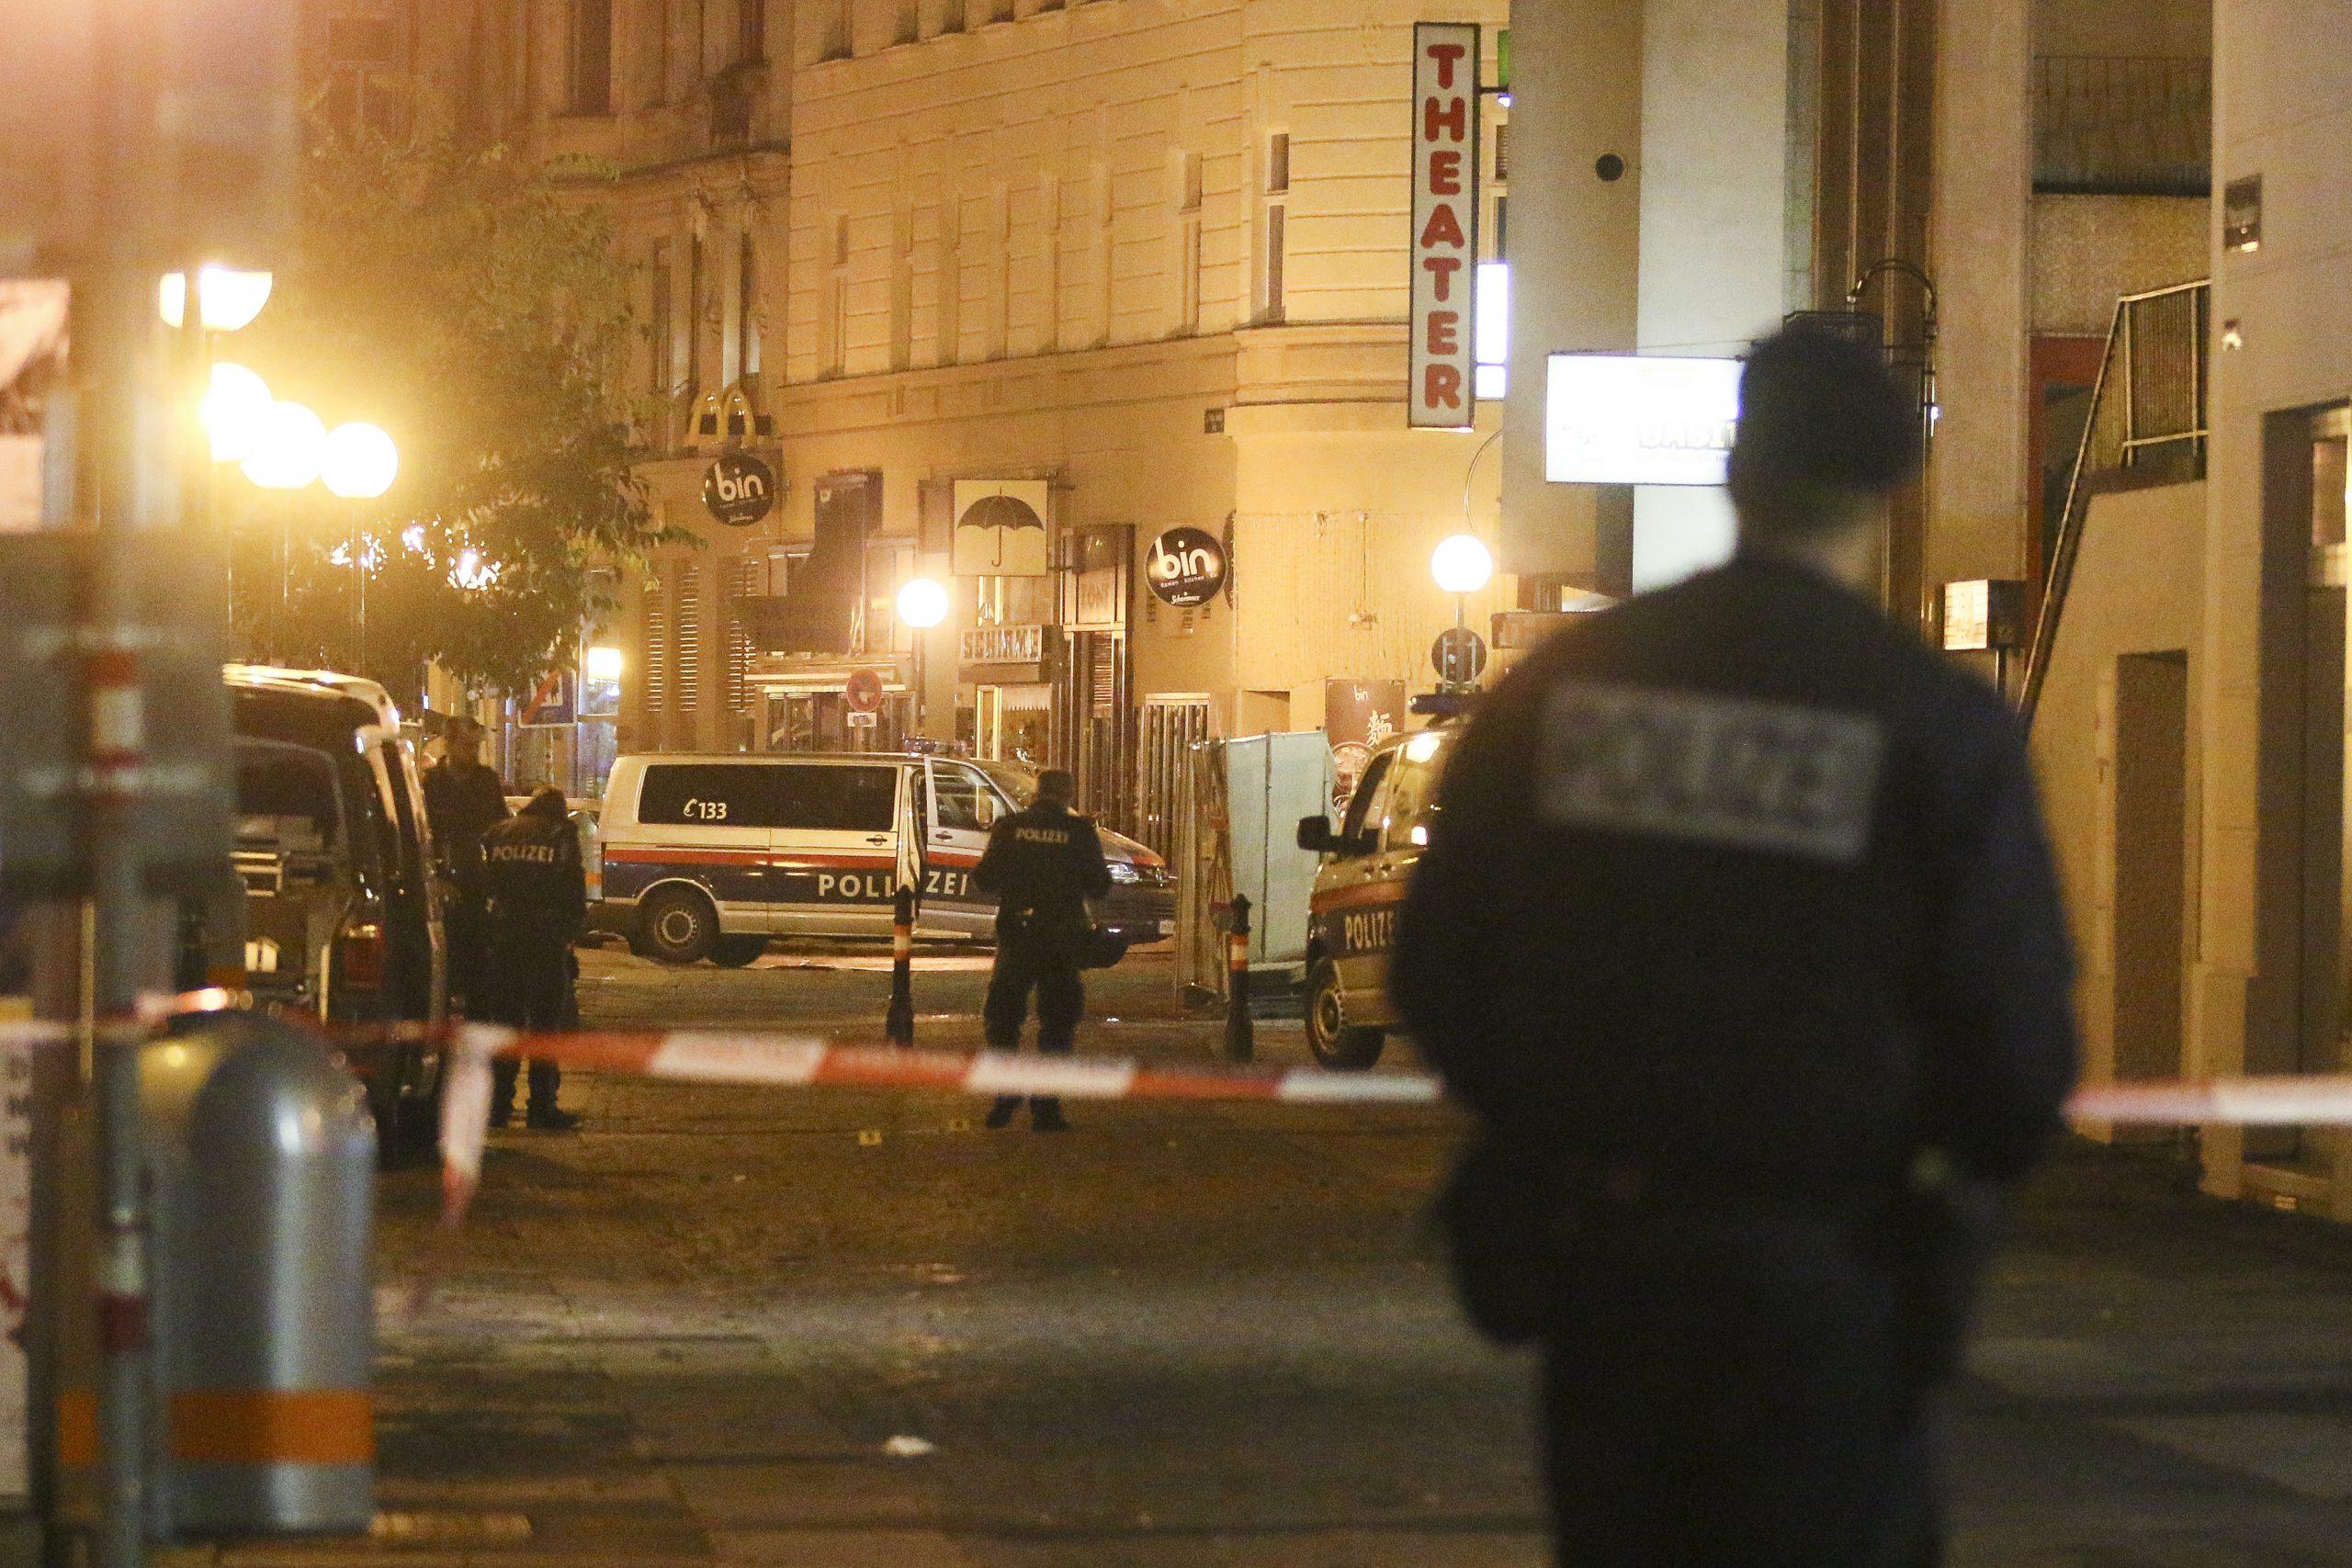 Hungarian Press Roundup: Vienna Shooting in the Spotlight